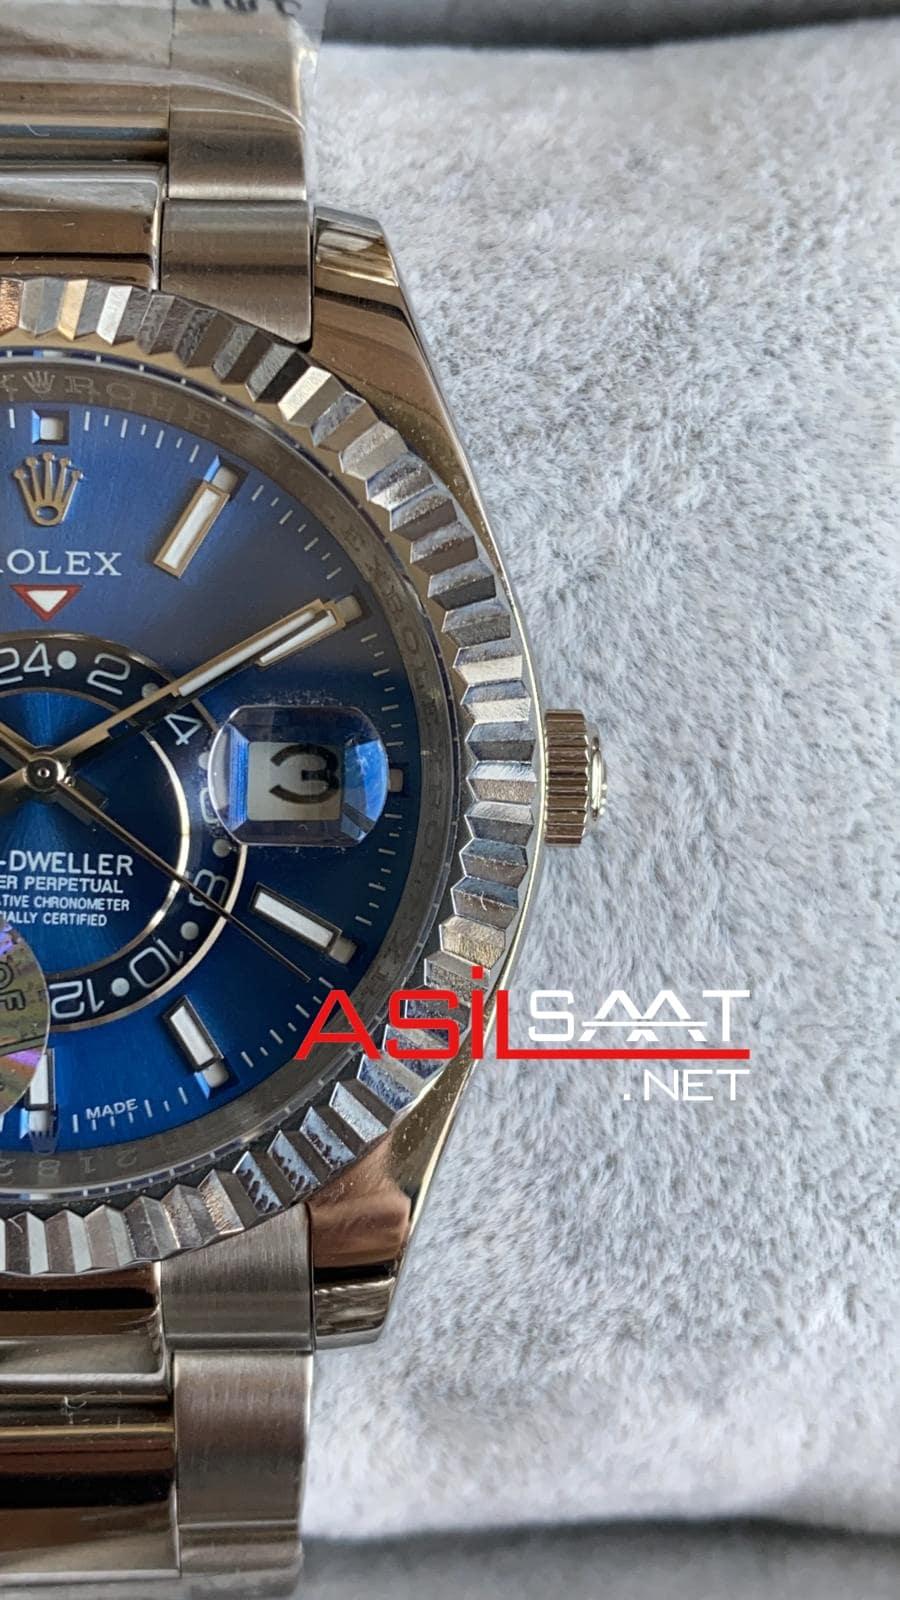 Rolex Oyster Perpetual Sky Dweller Silver Replika Saat ROLSKY003